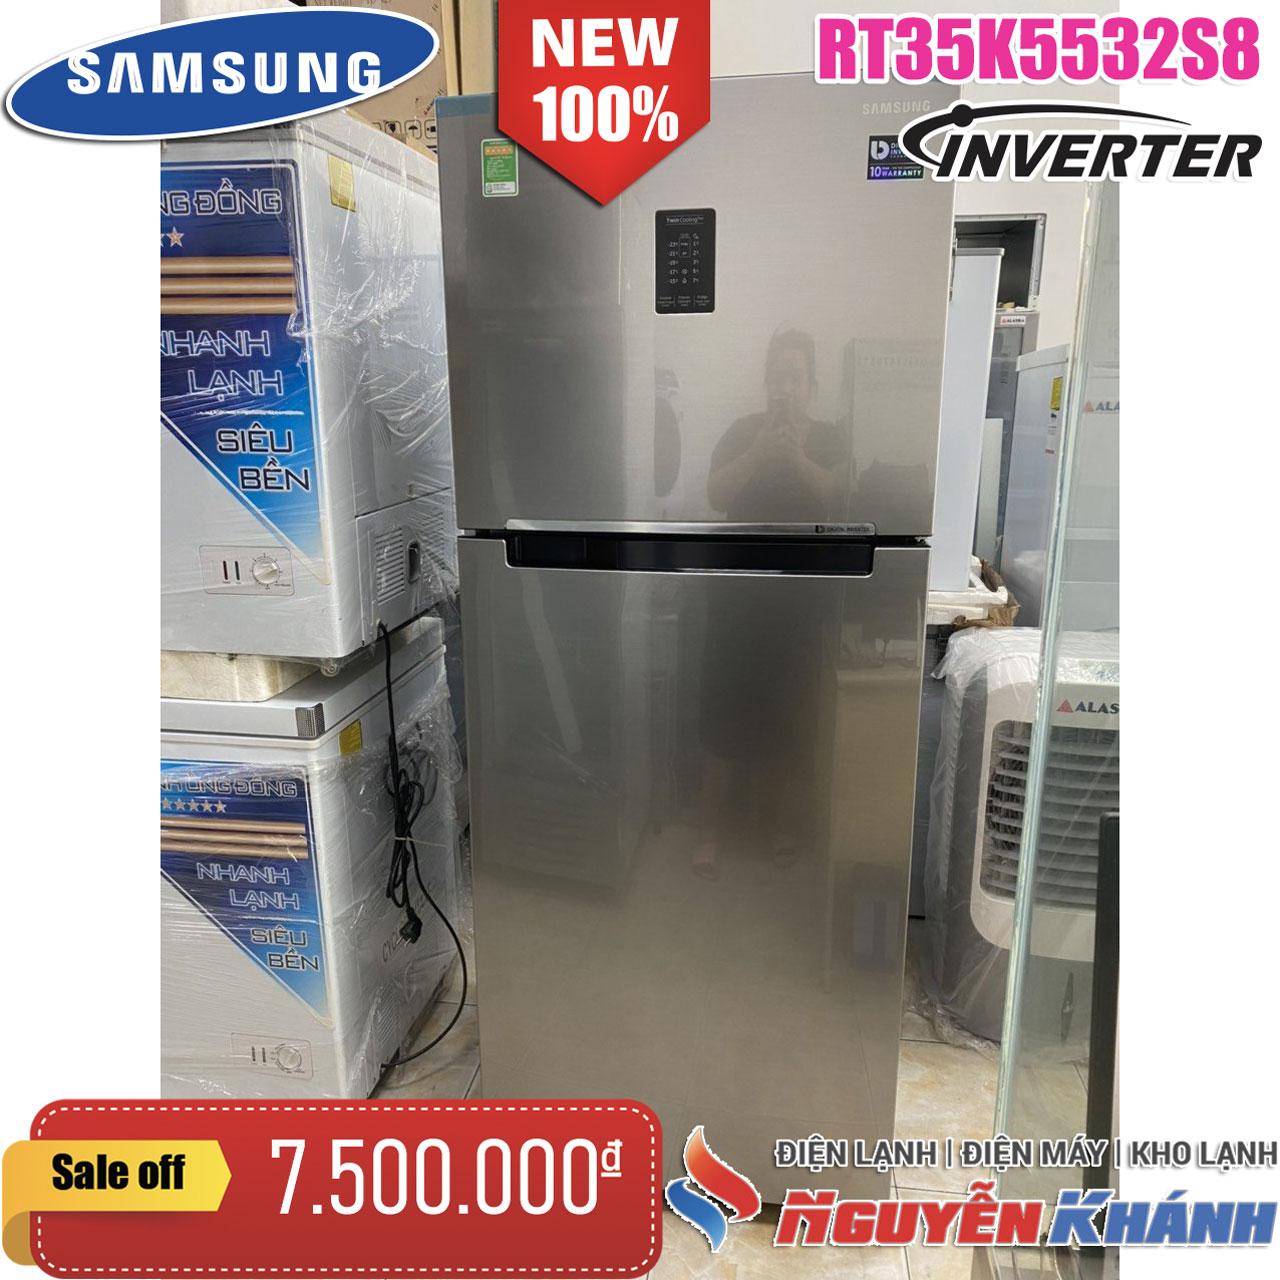 Tủ lạnh Samsung InverterRT35K5532S8